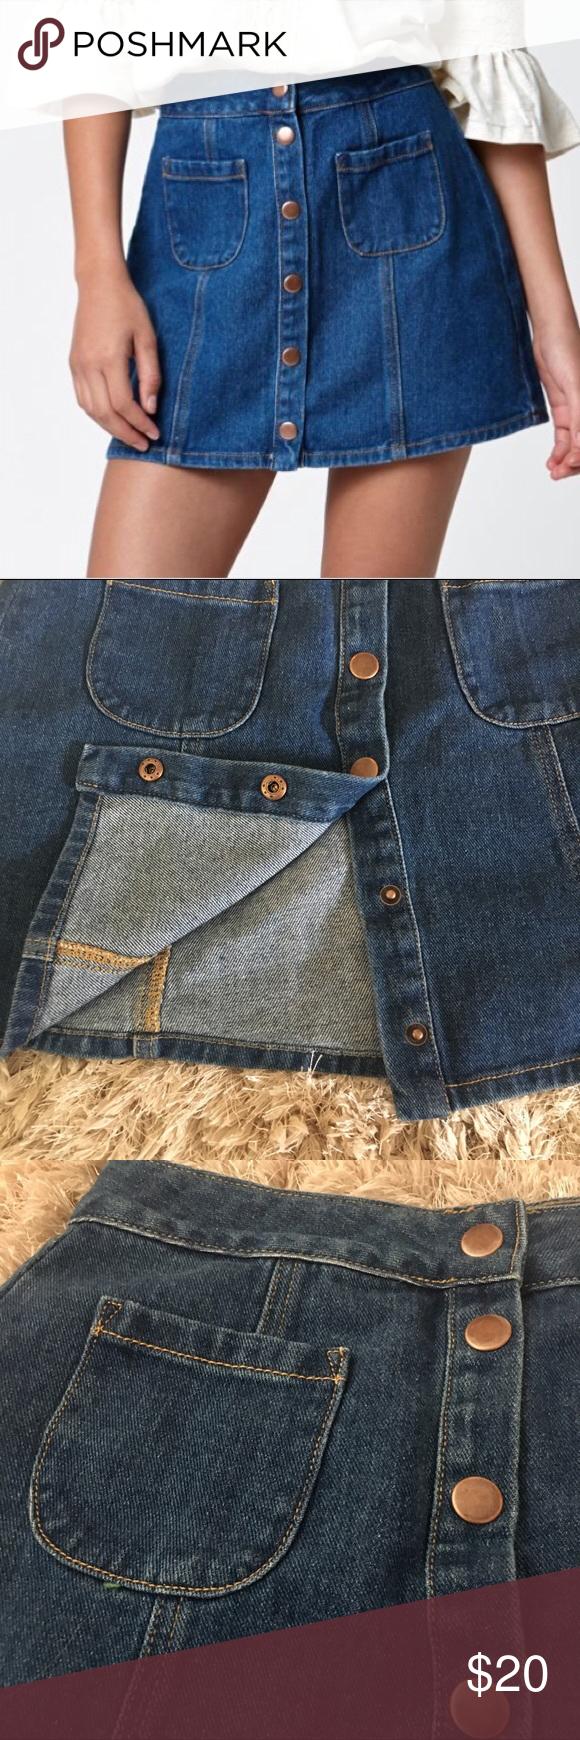 1d1d04368e Brandy Melville Denim Mini Size 27 Brandi Melville denim mini in size 27.  Cute skirt